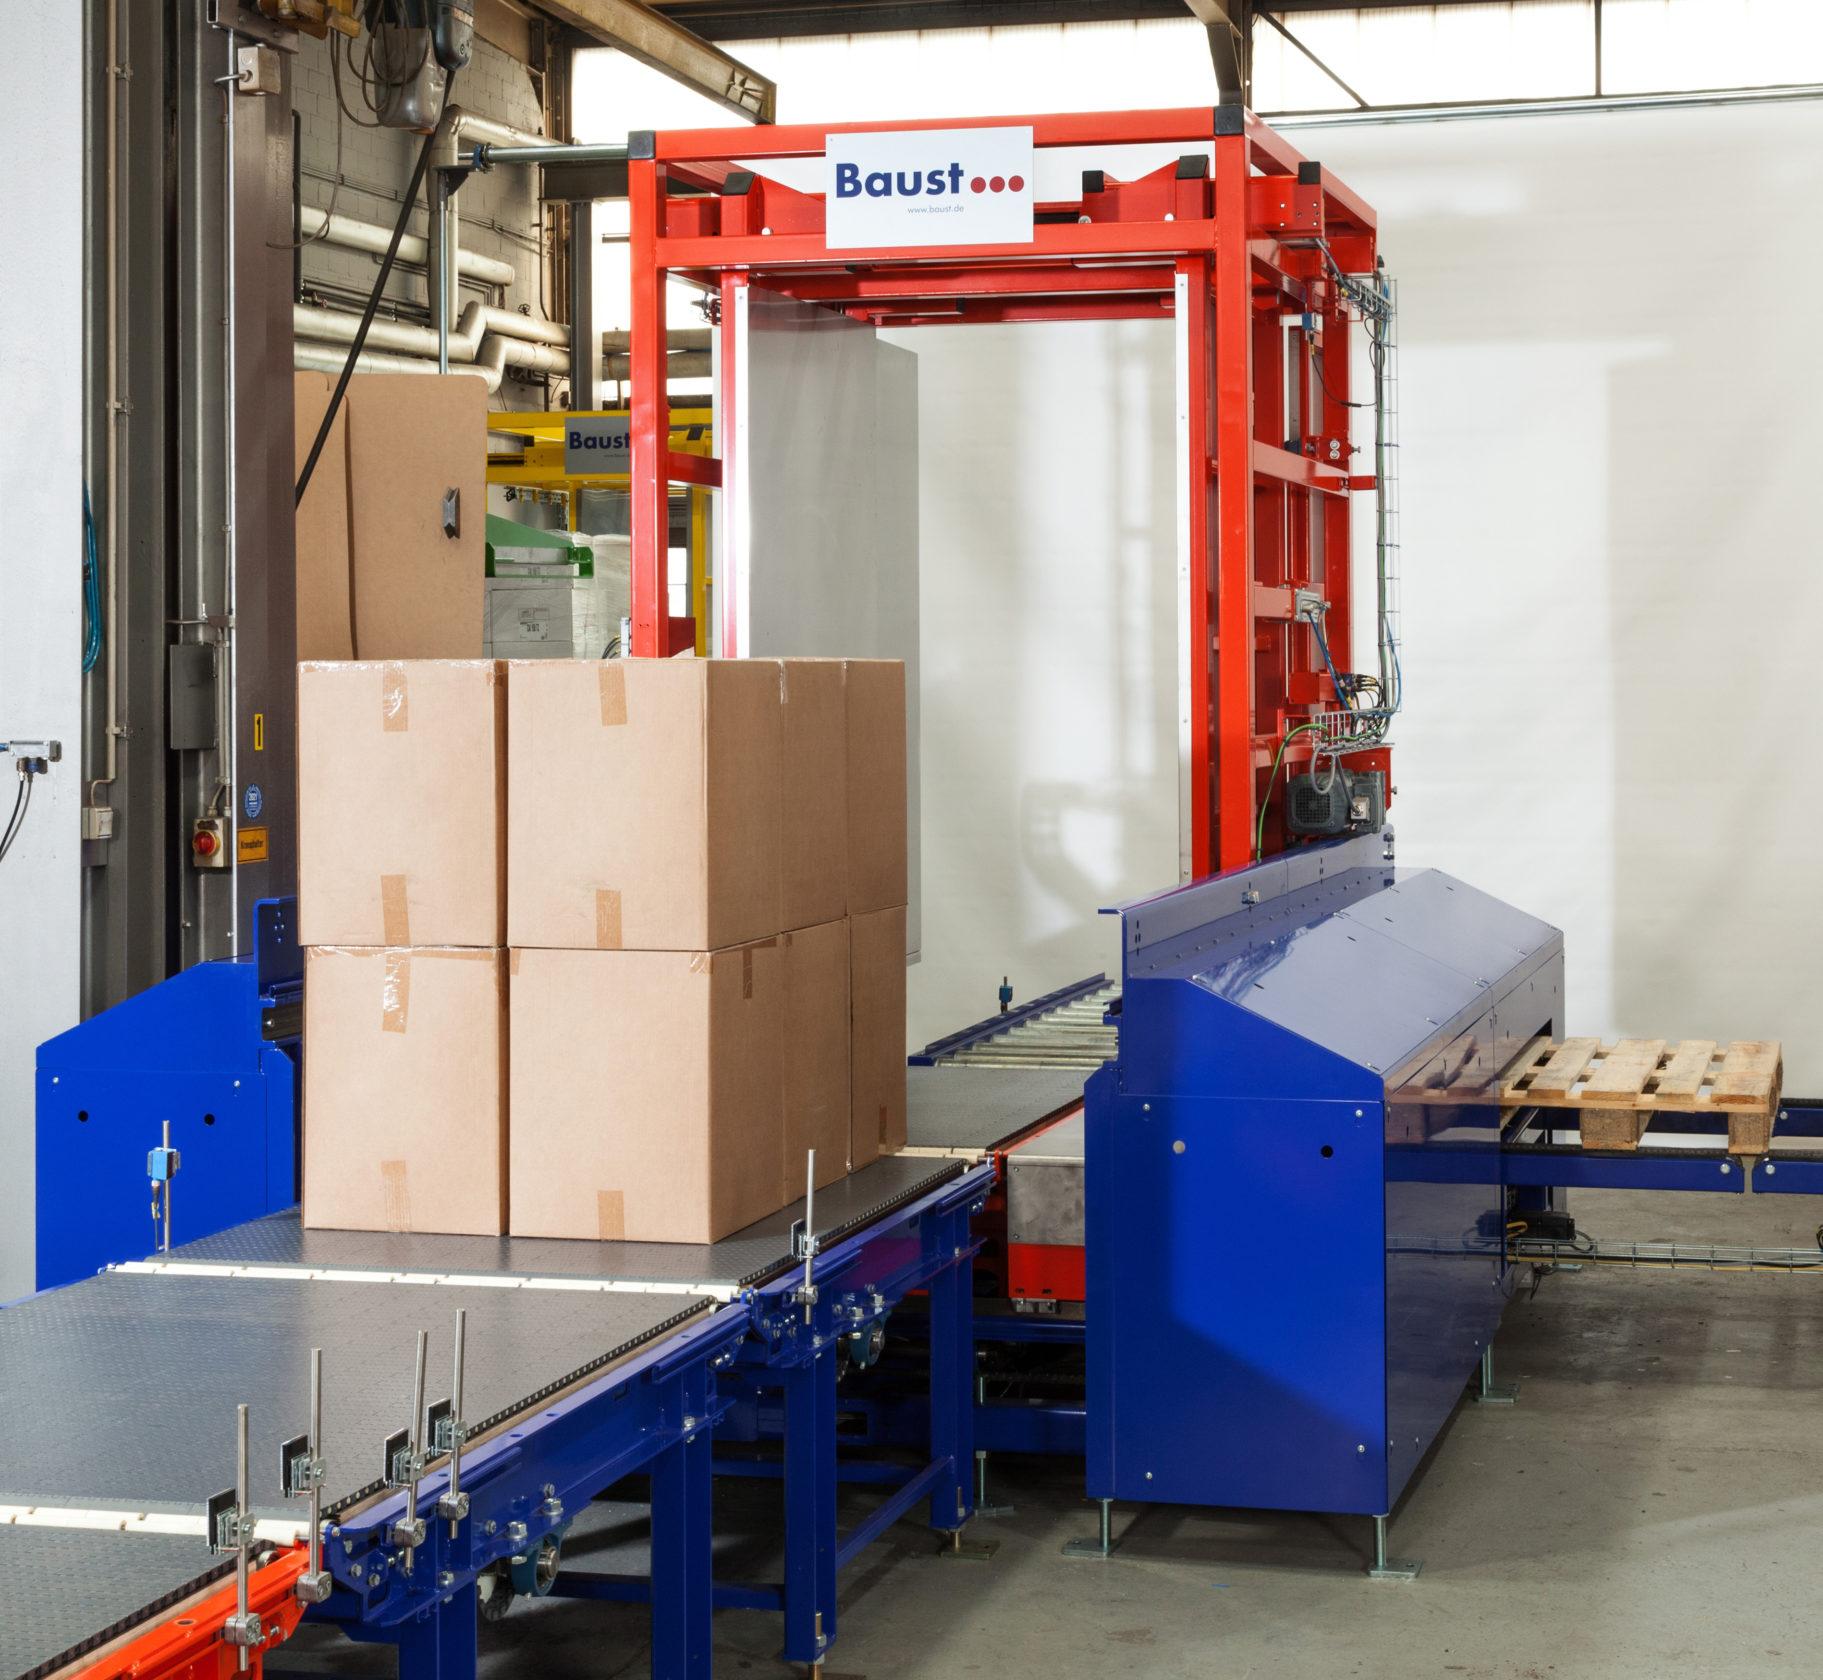 Vollautomatische Palettierer Depalettierer Automatic Palletizing Depalletizing Intralogistics Baust Dp 6000 5